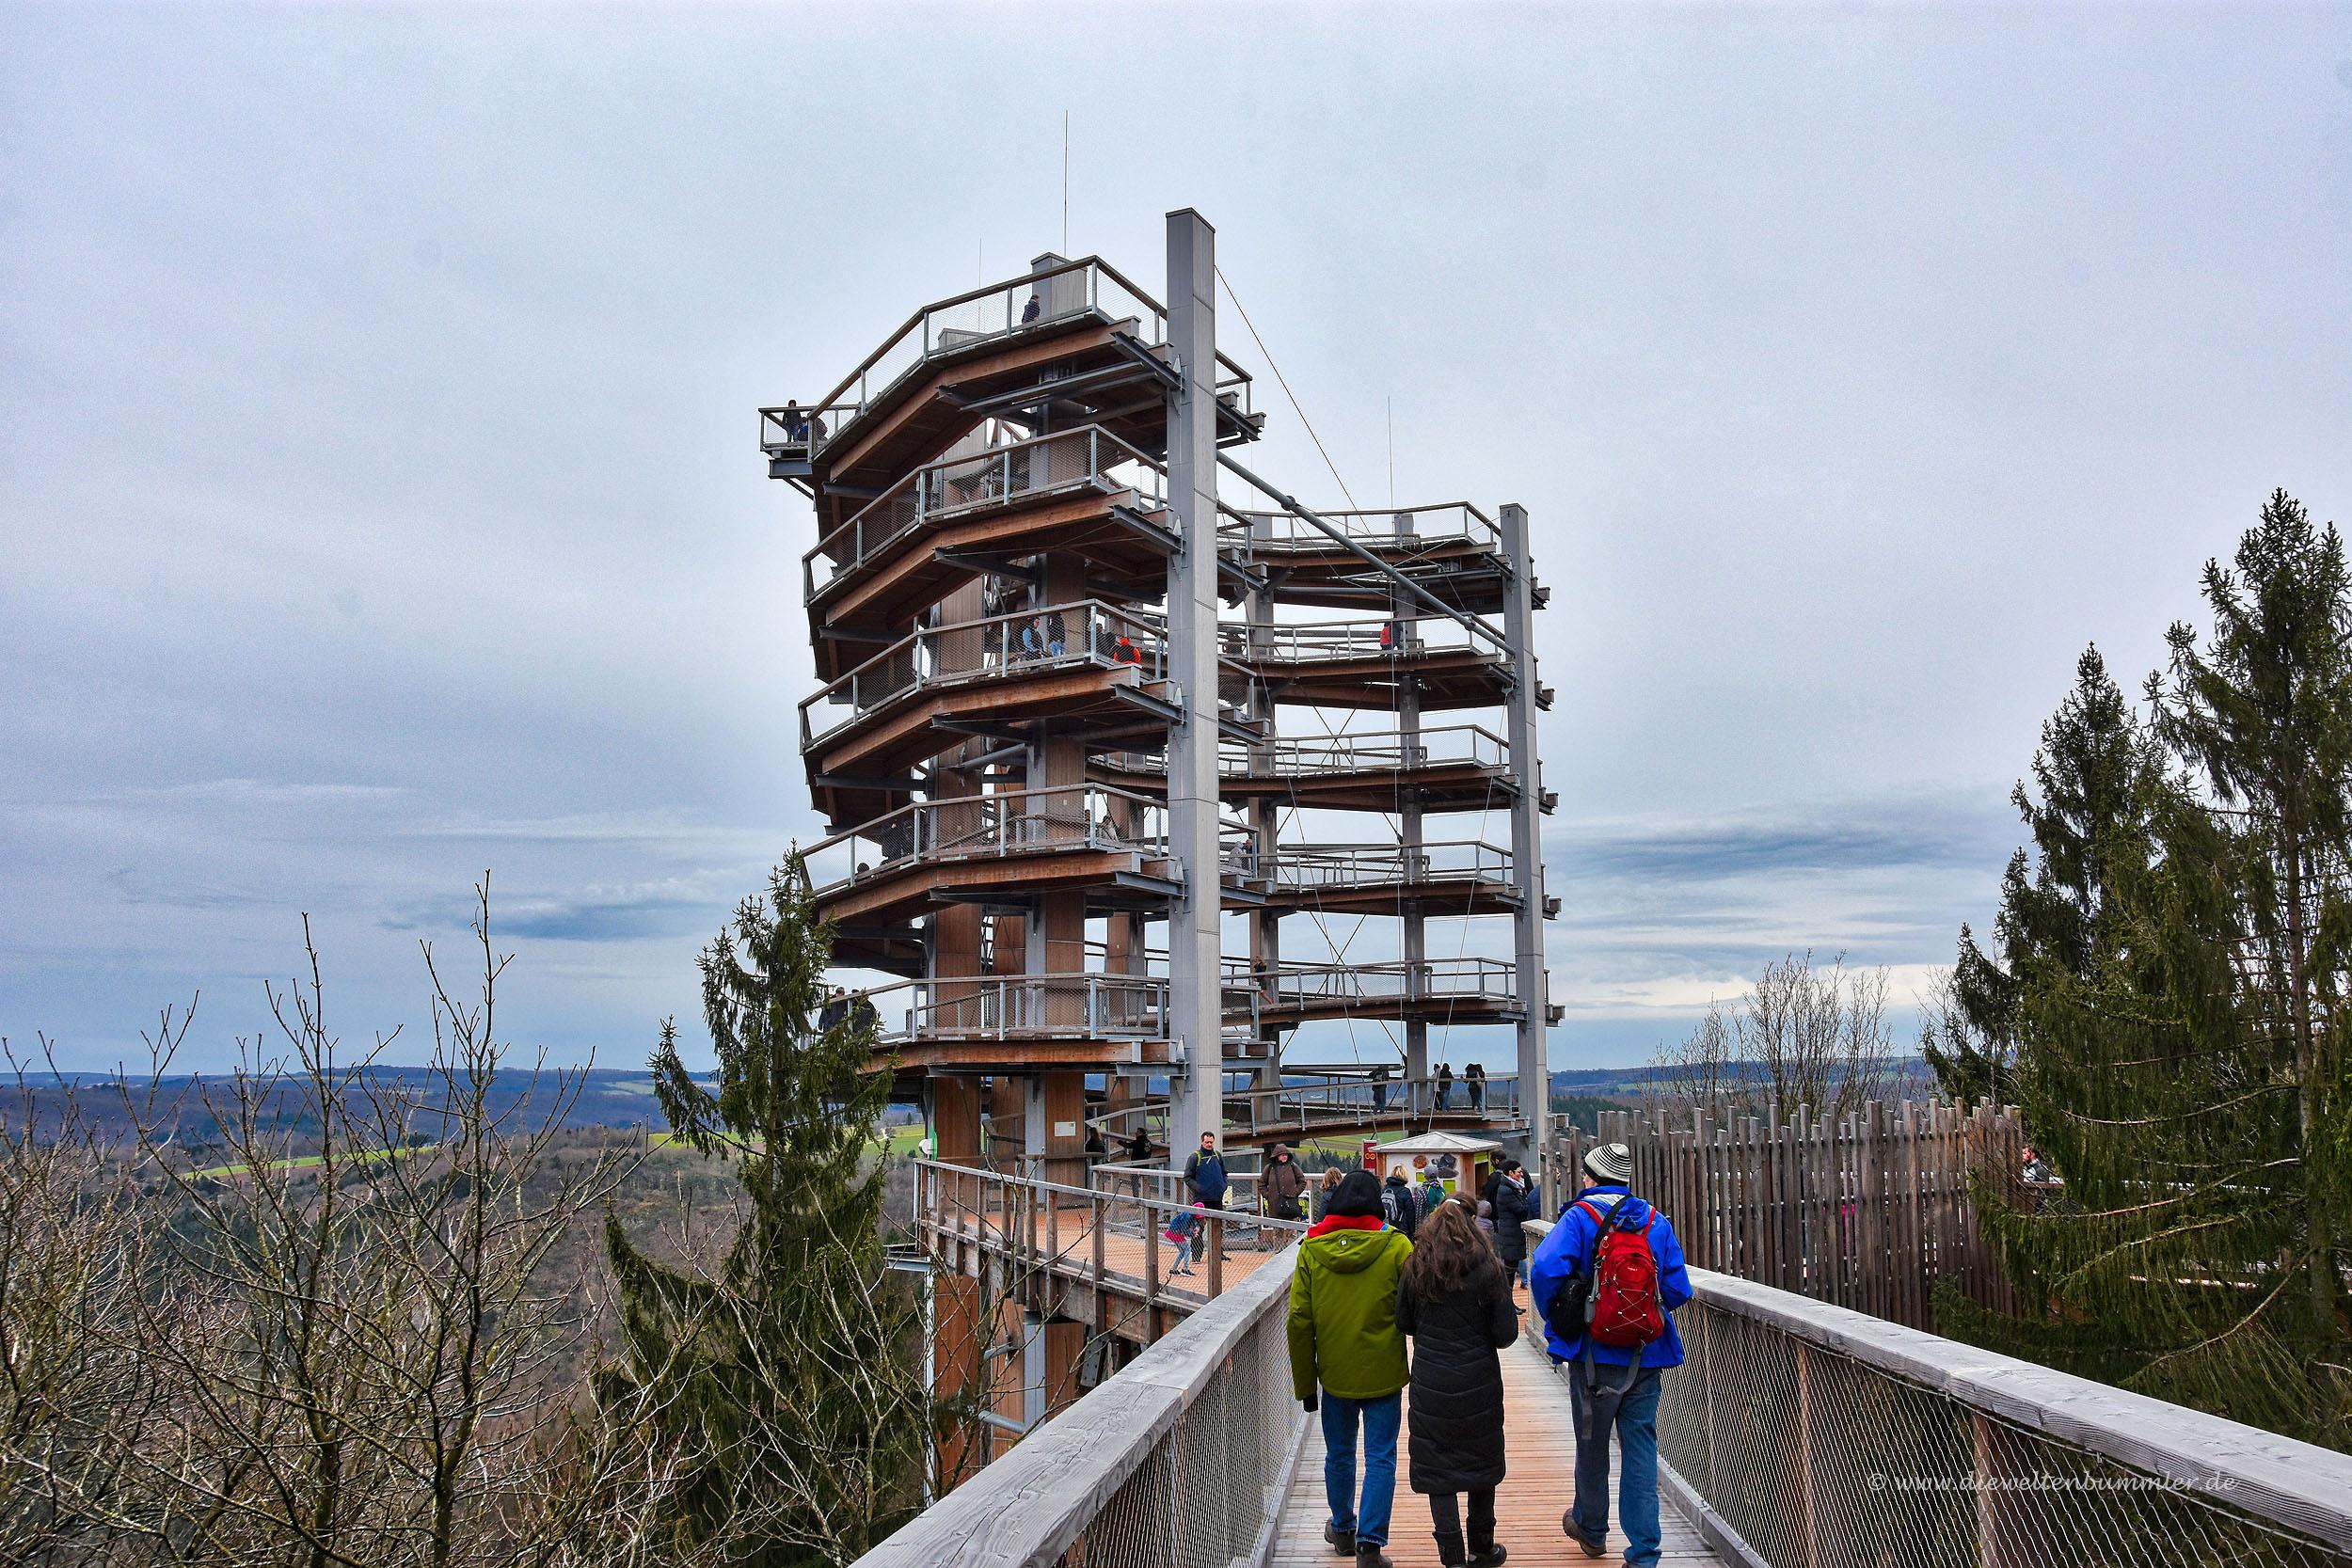 Aussichtsturm an der Saarschleife